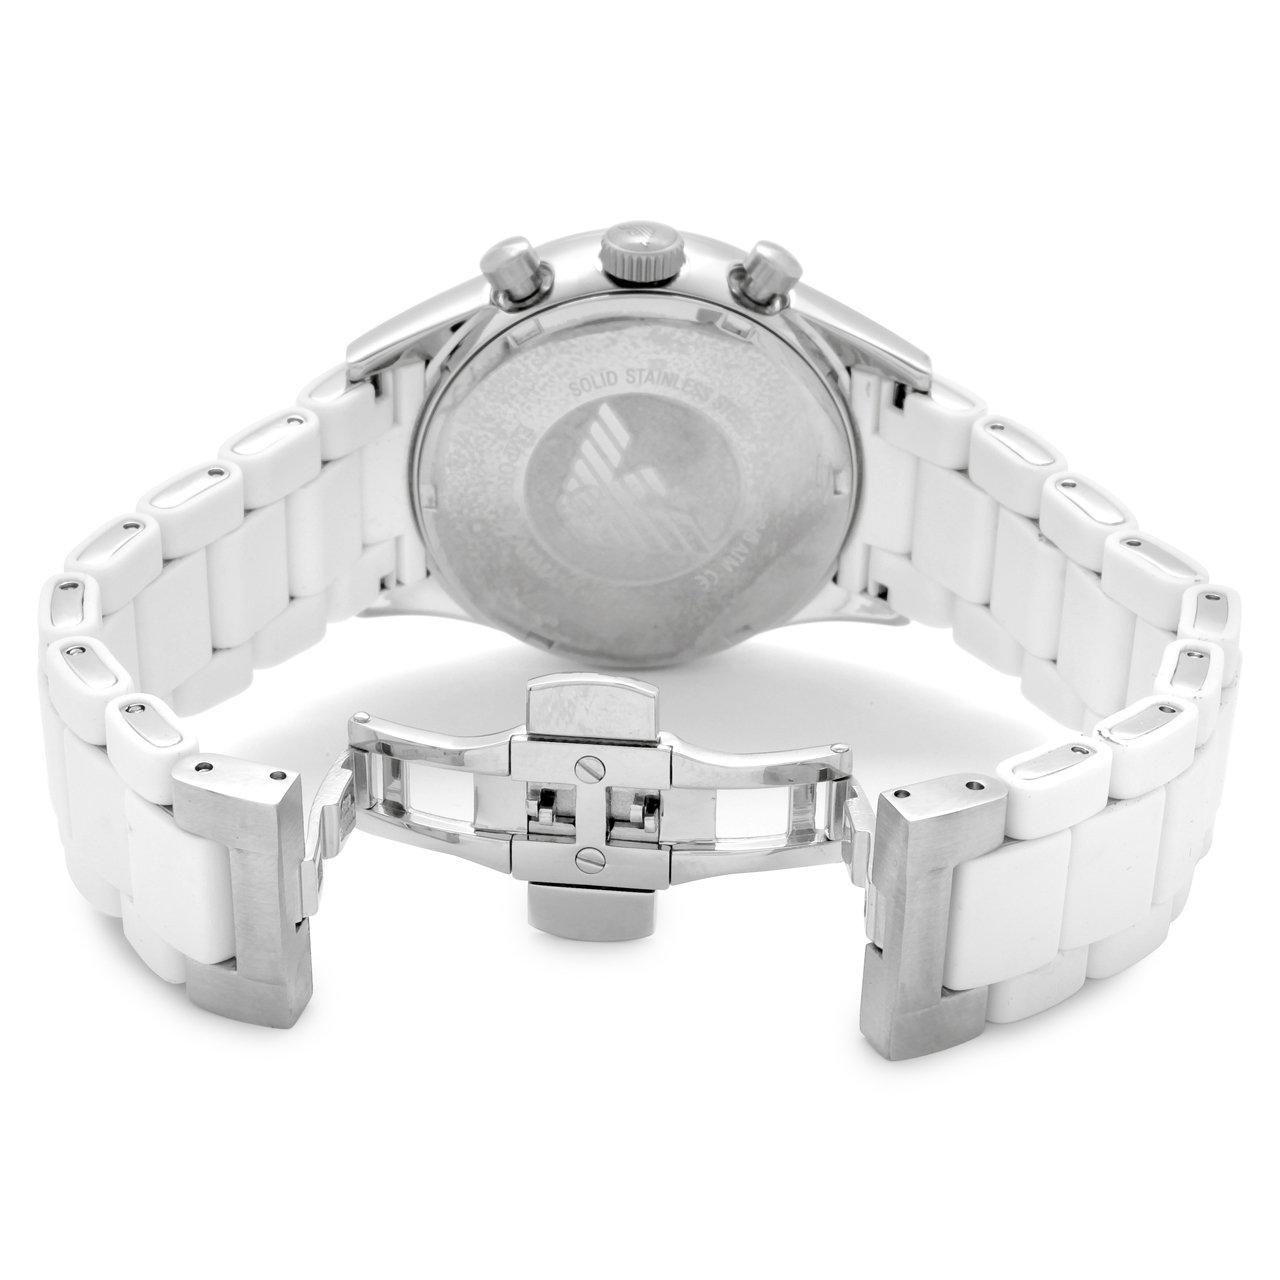 Đồng hồ nữ Emporio Armani Womens AR5867 Silver Dial Watch